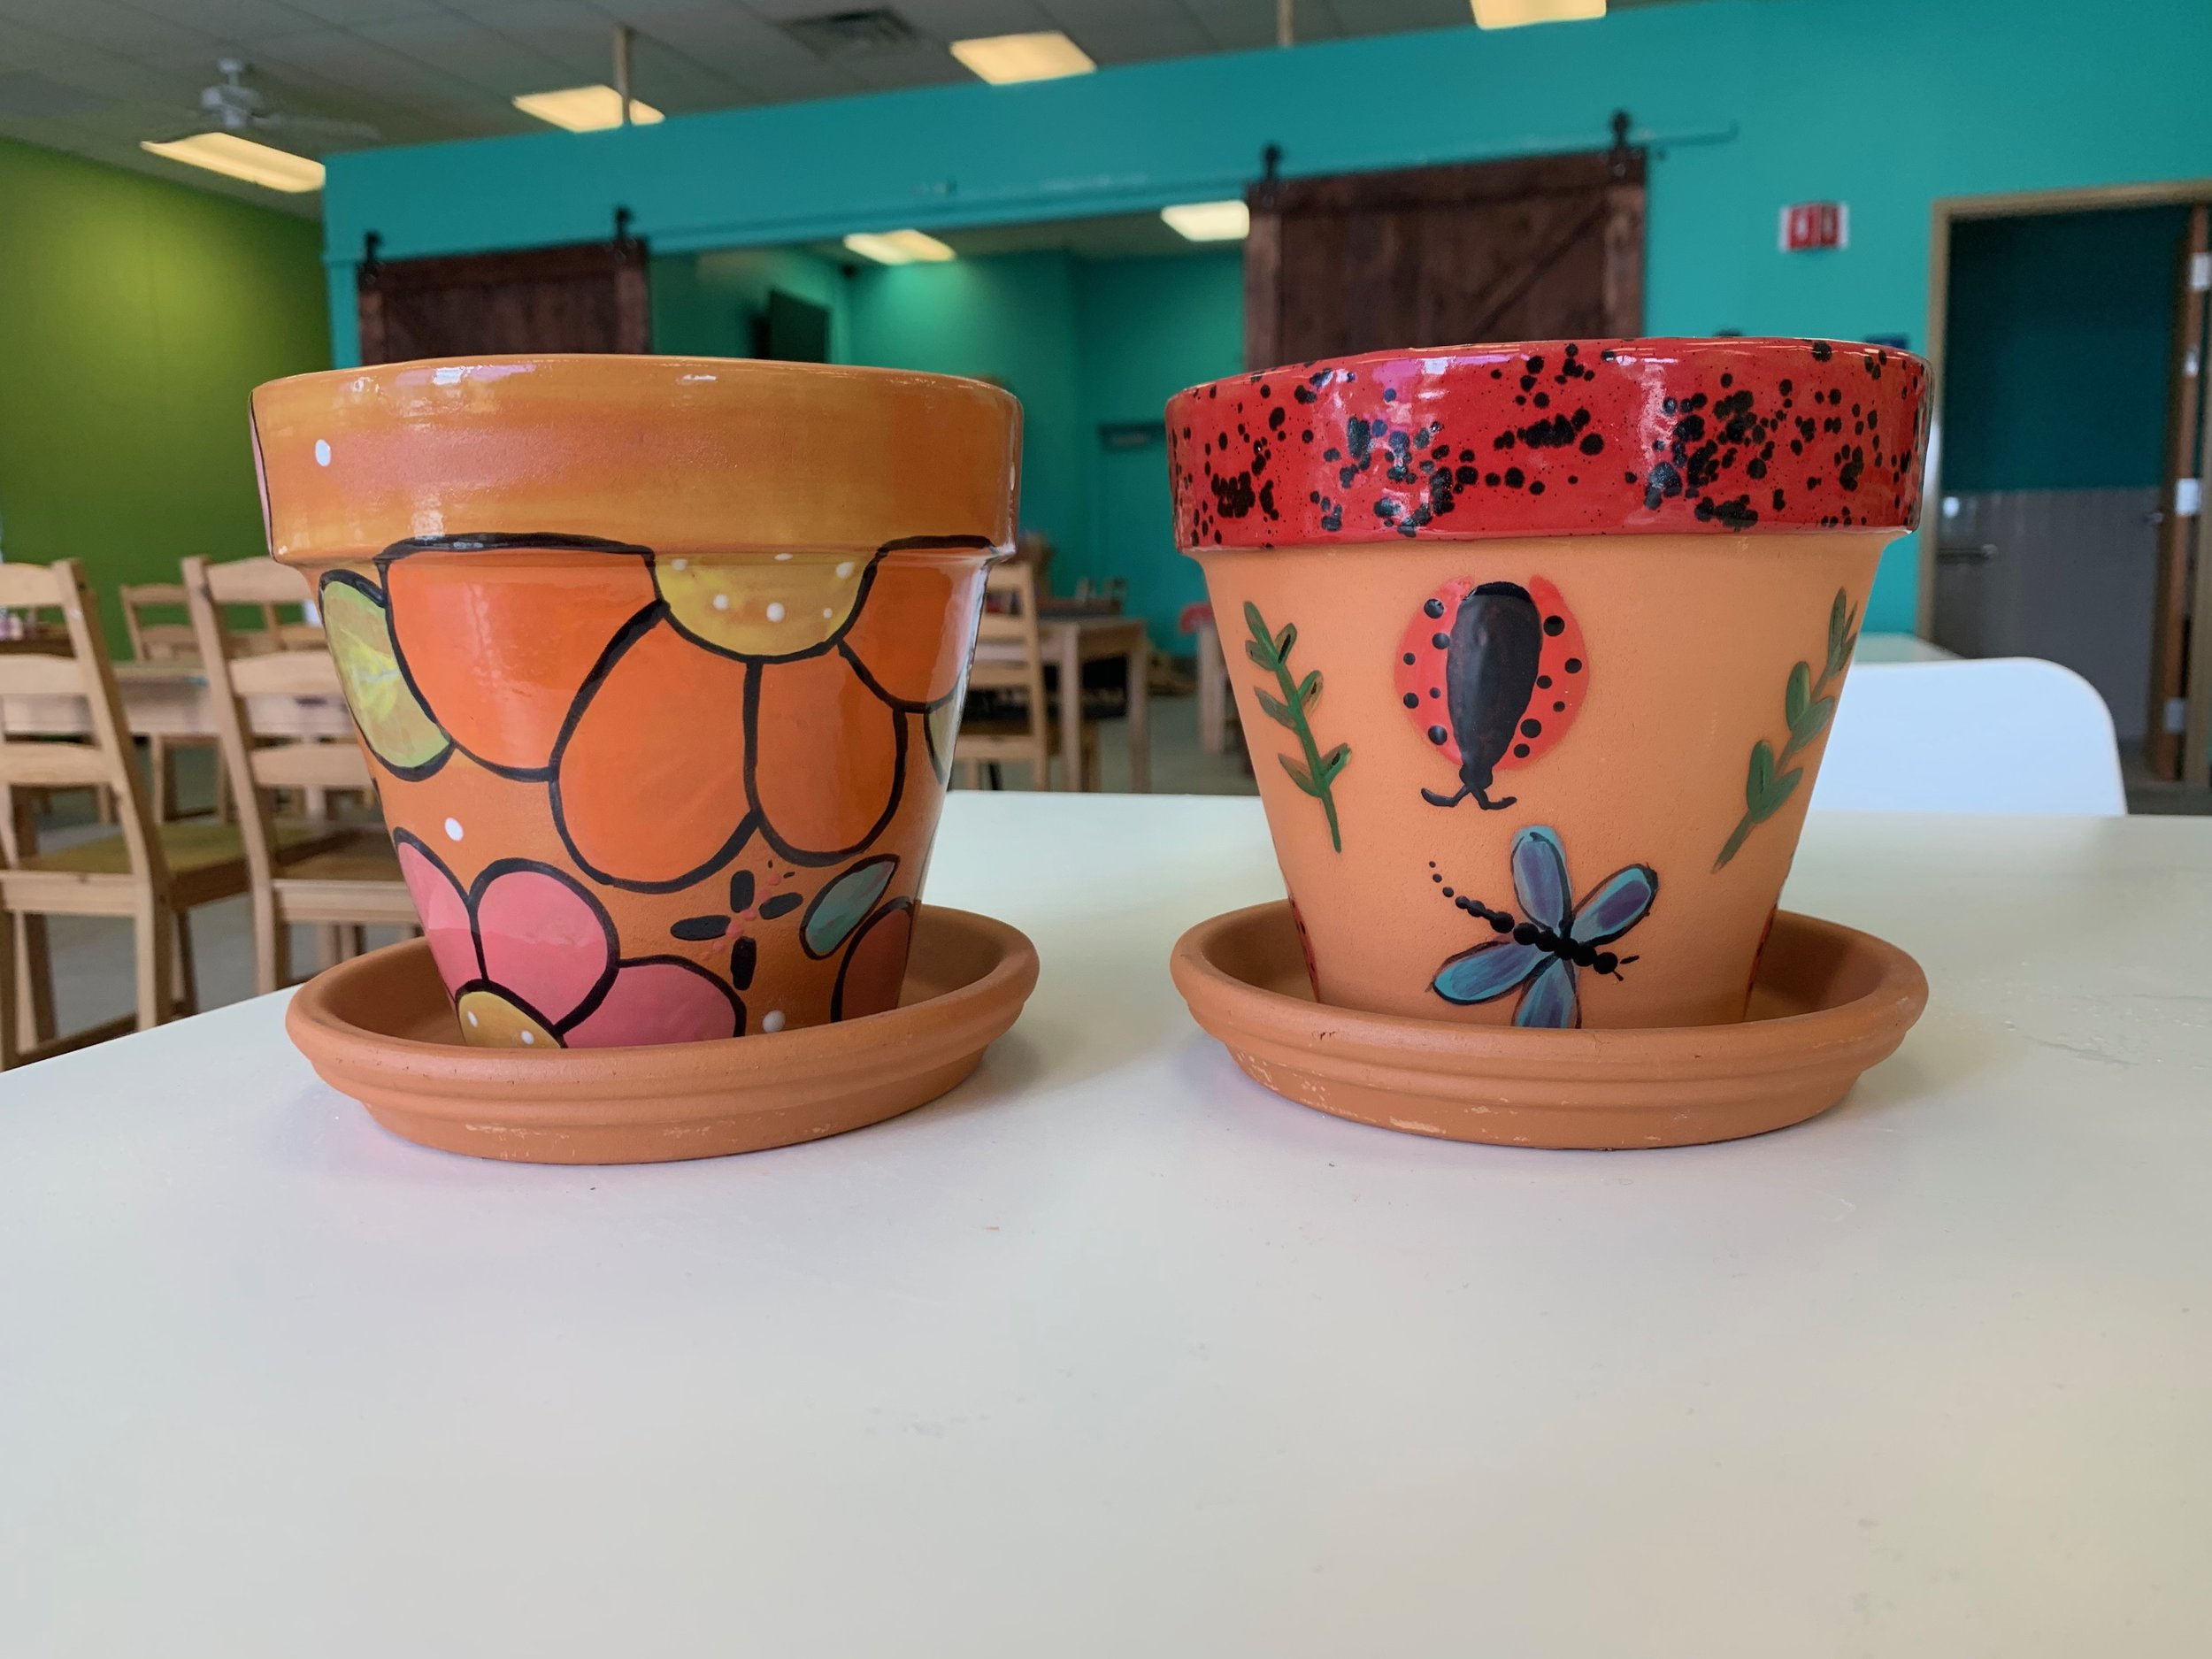 terracotta flower pots 2019.JPG